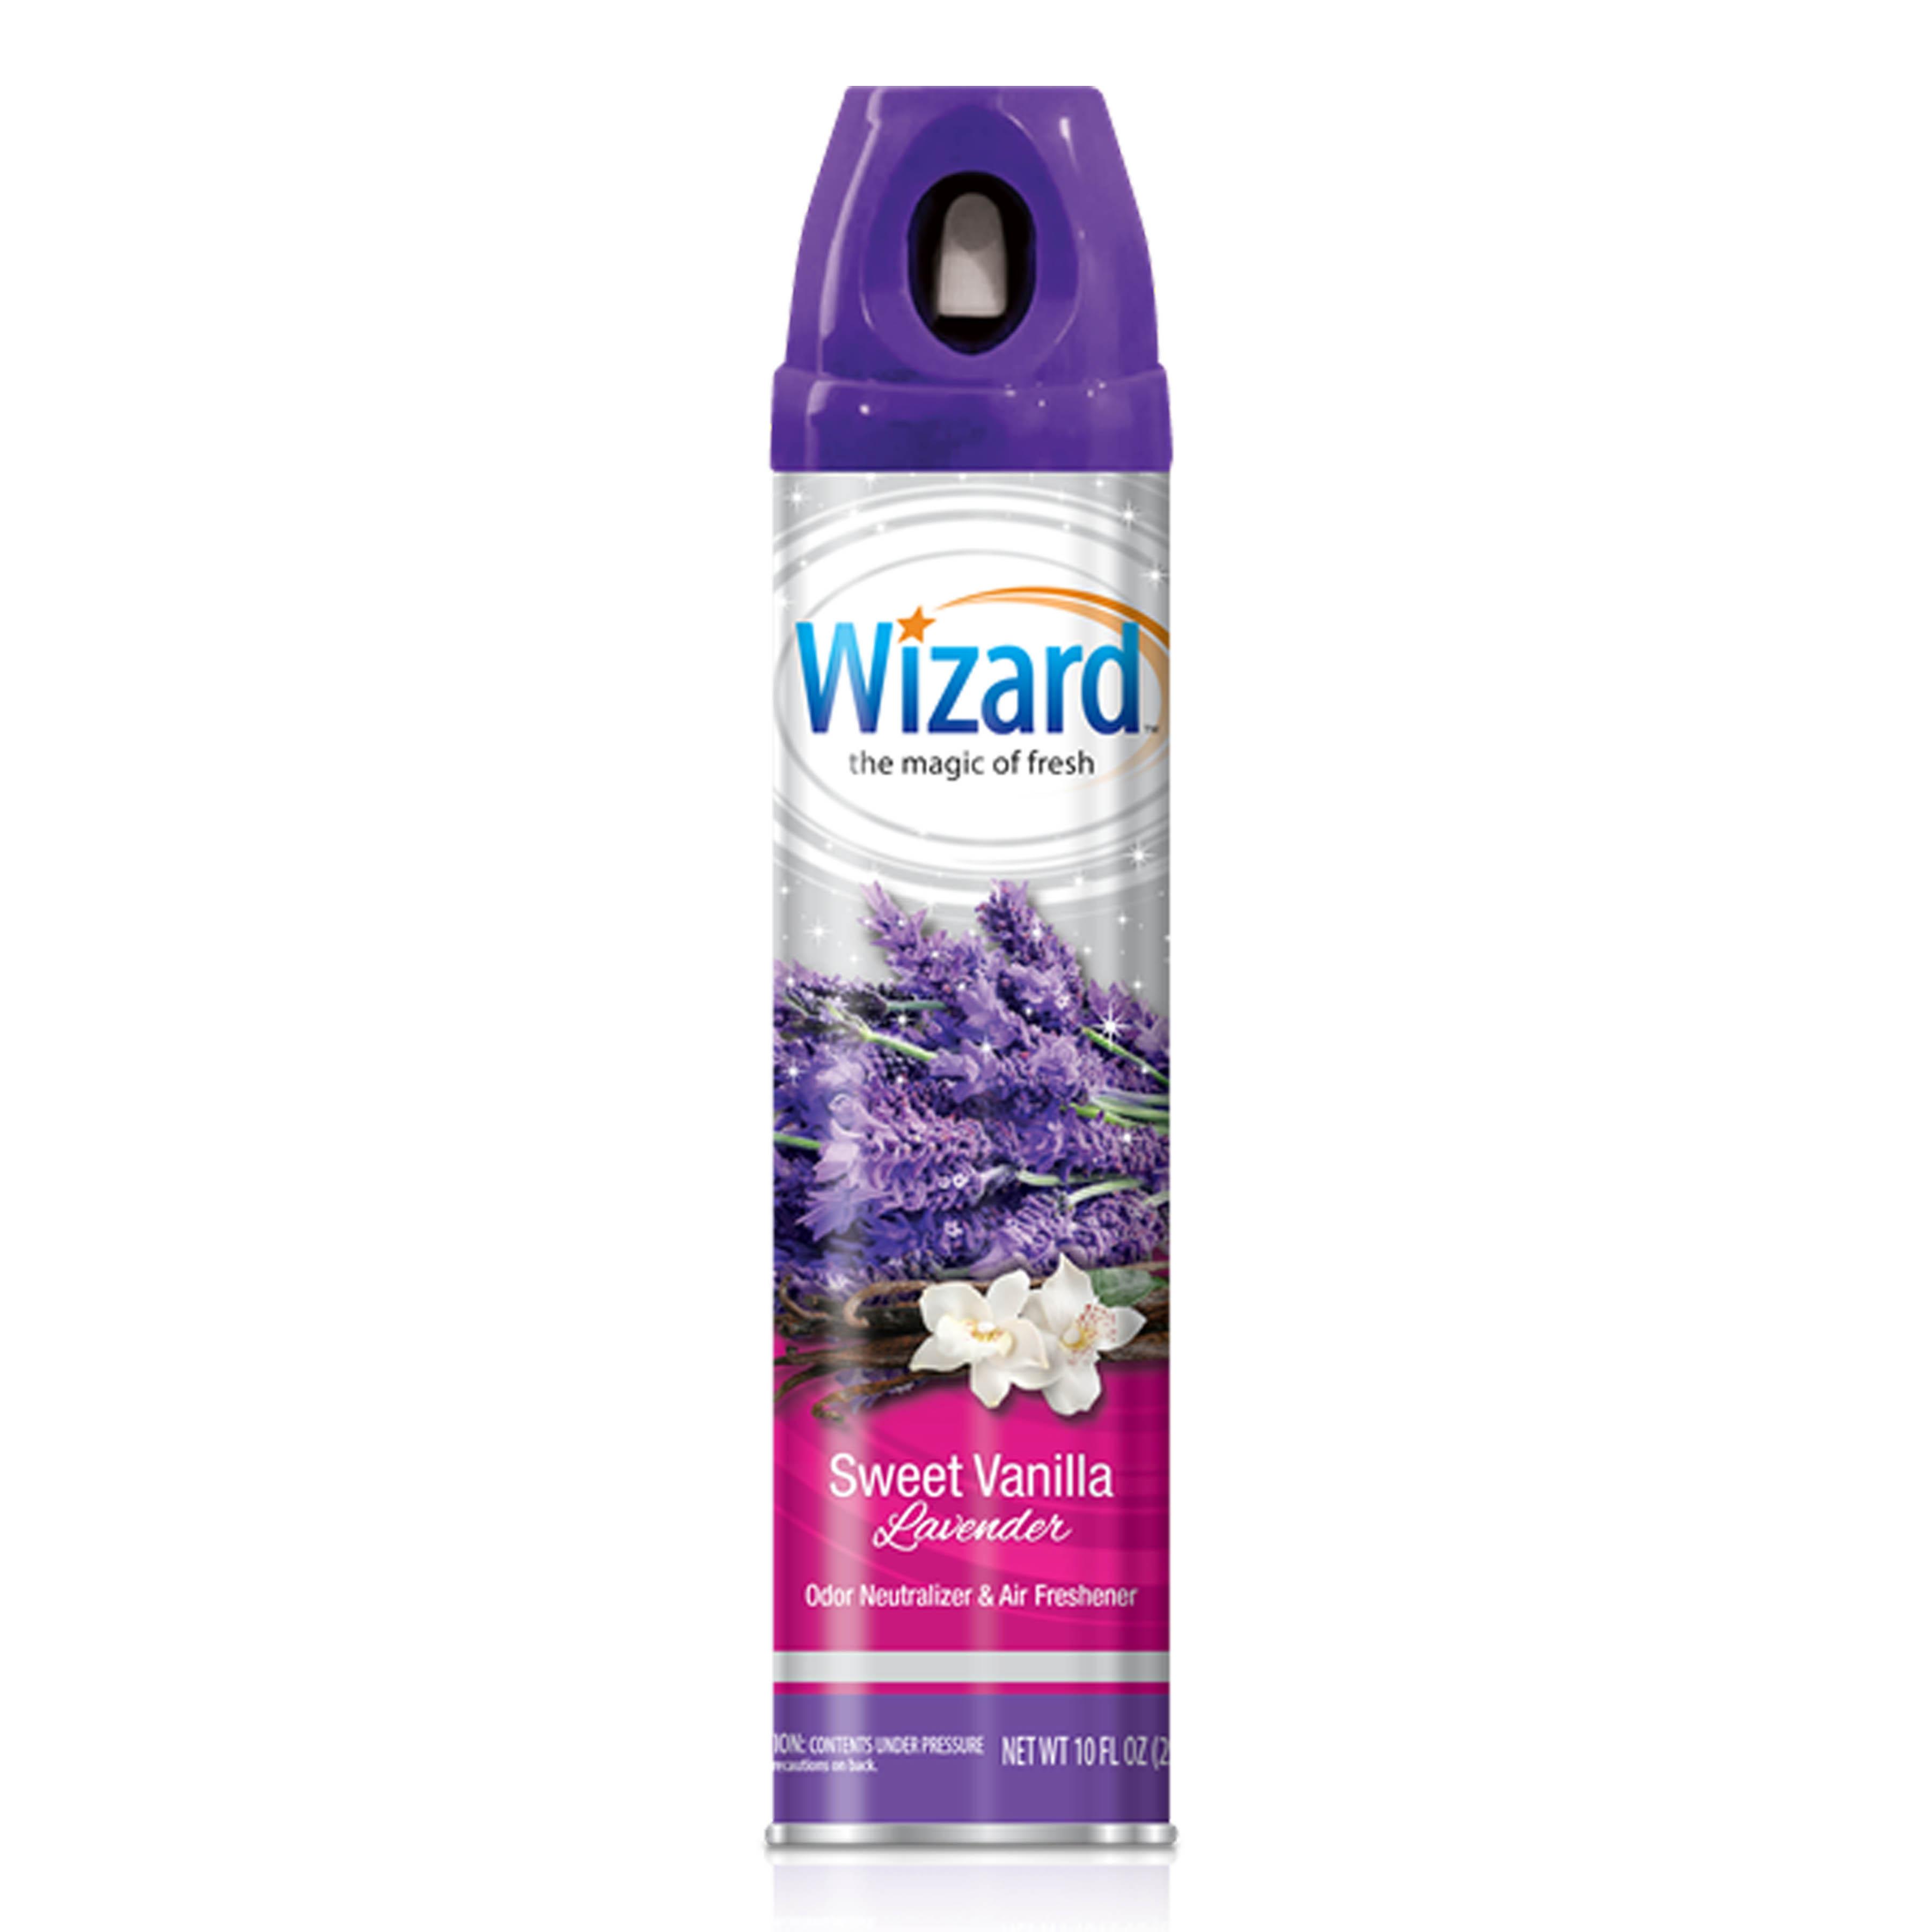 Wizard 10 oz. Aerosol Spray, Sweet Vanilla Lavender